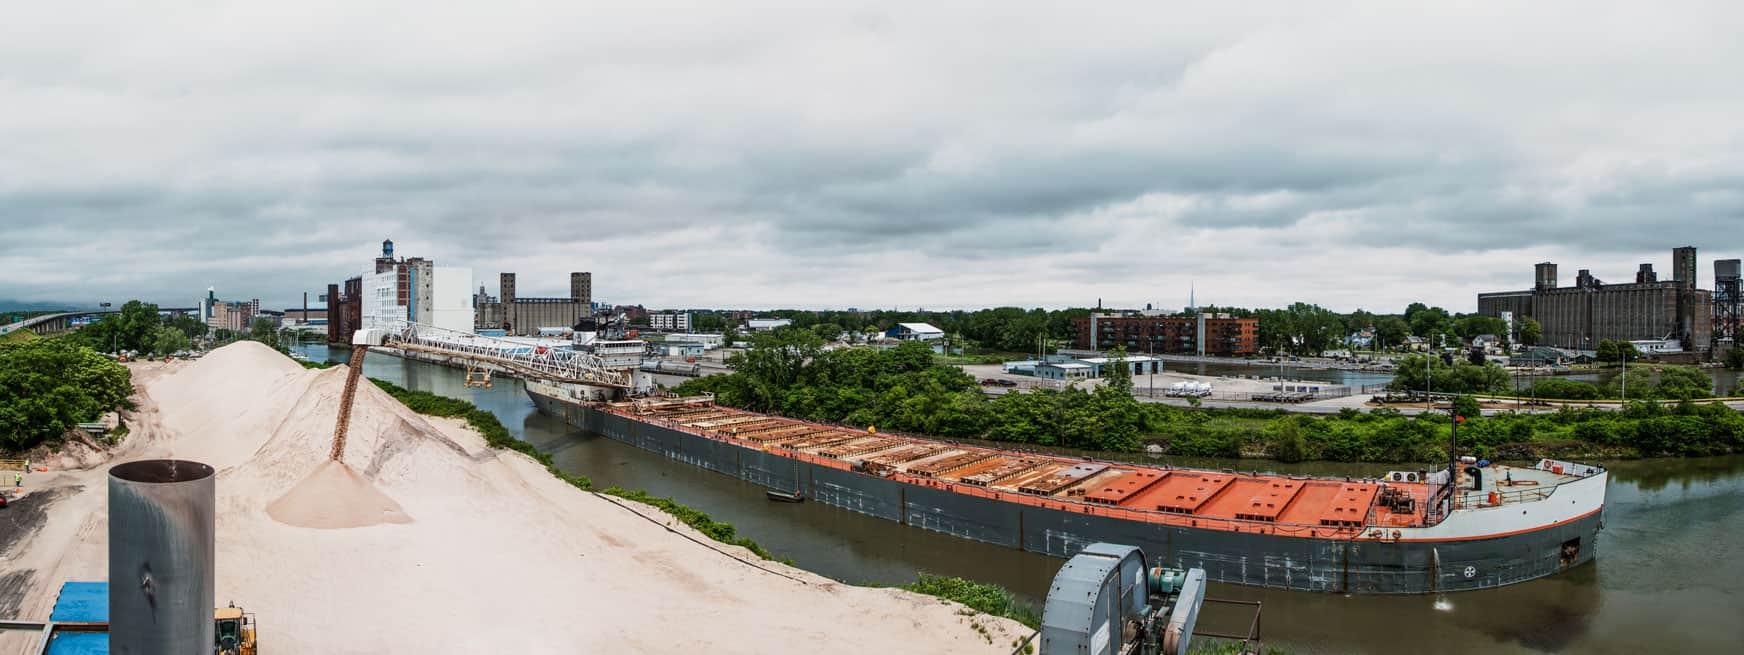 Buffalo 2019 Panorama